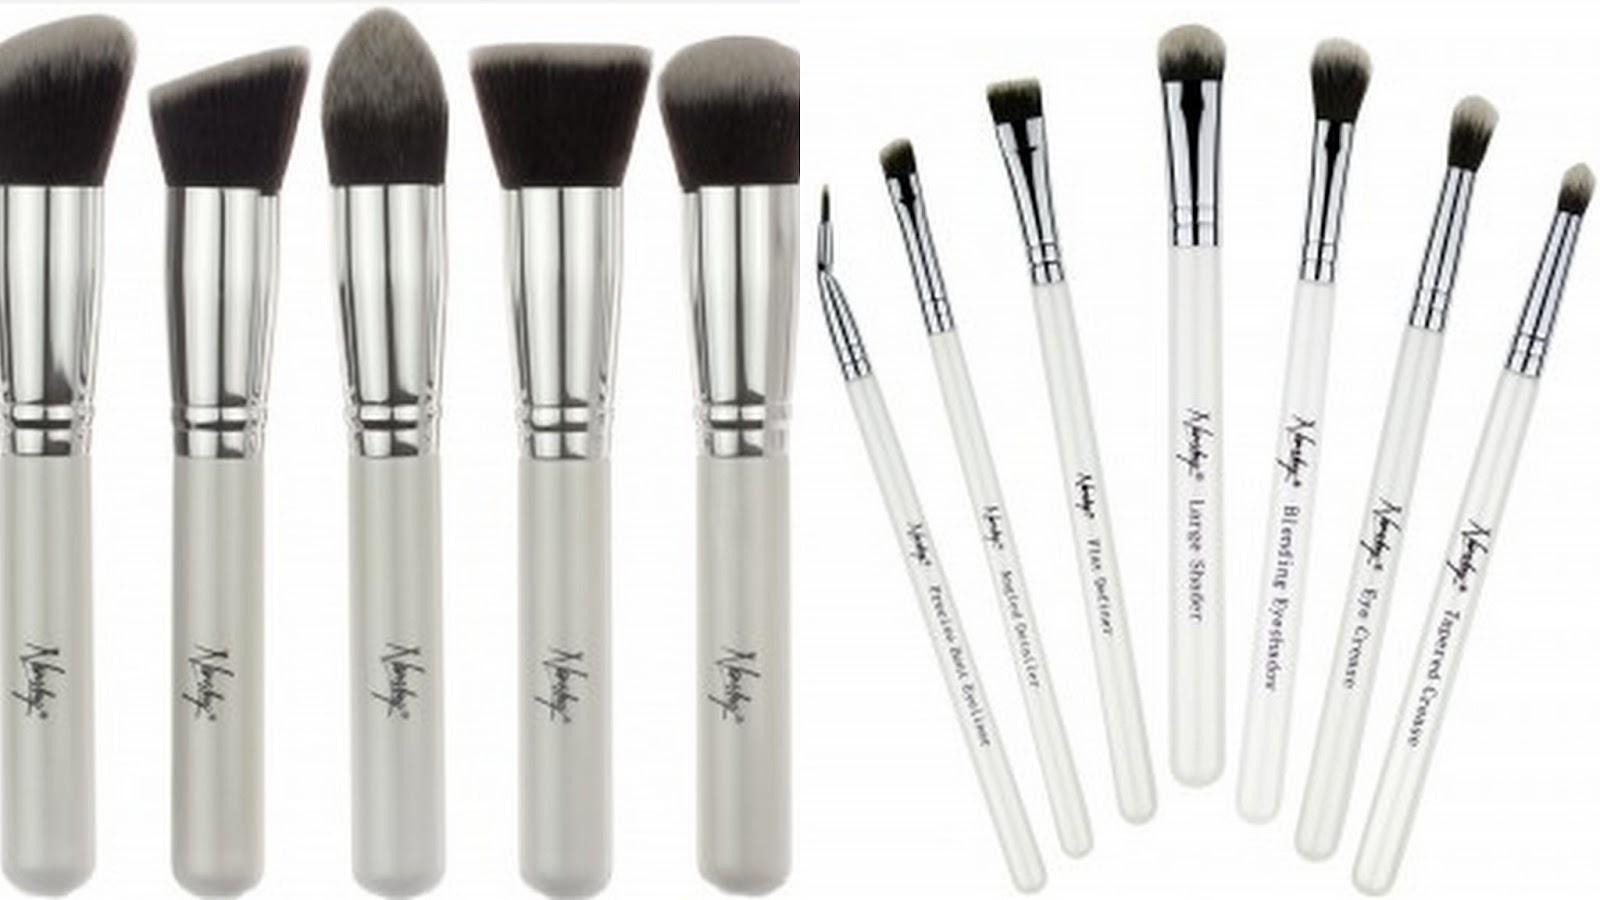 Nanshy Makeup Brushes